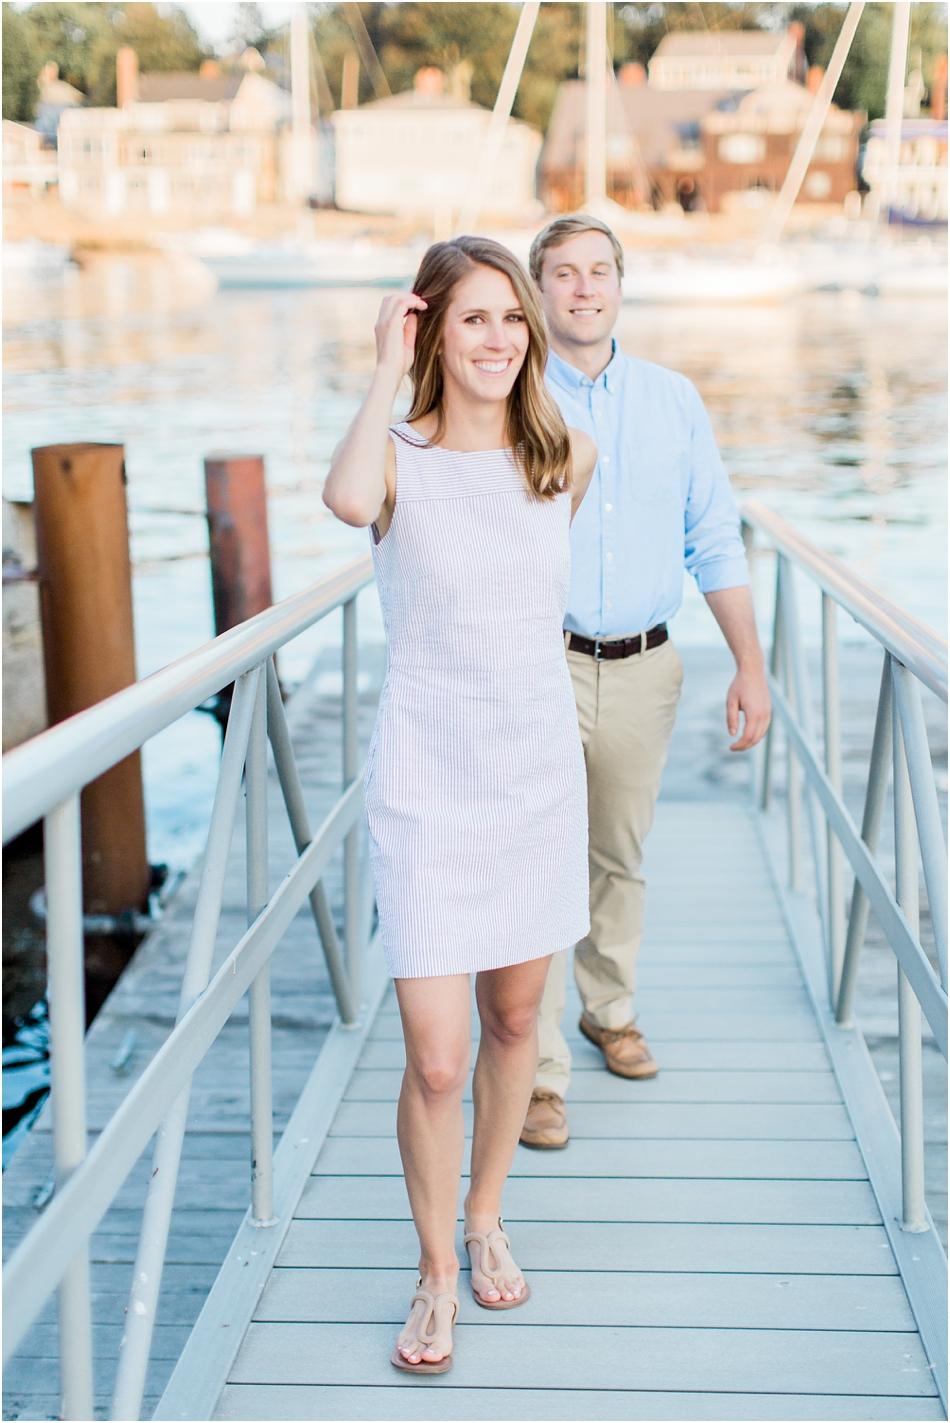 rockport_ma_engagement_kelly_zach_cape_cod_boston_new_england_wedding_photographer_Meredith_Jane_Photography_photo_2327.jpg